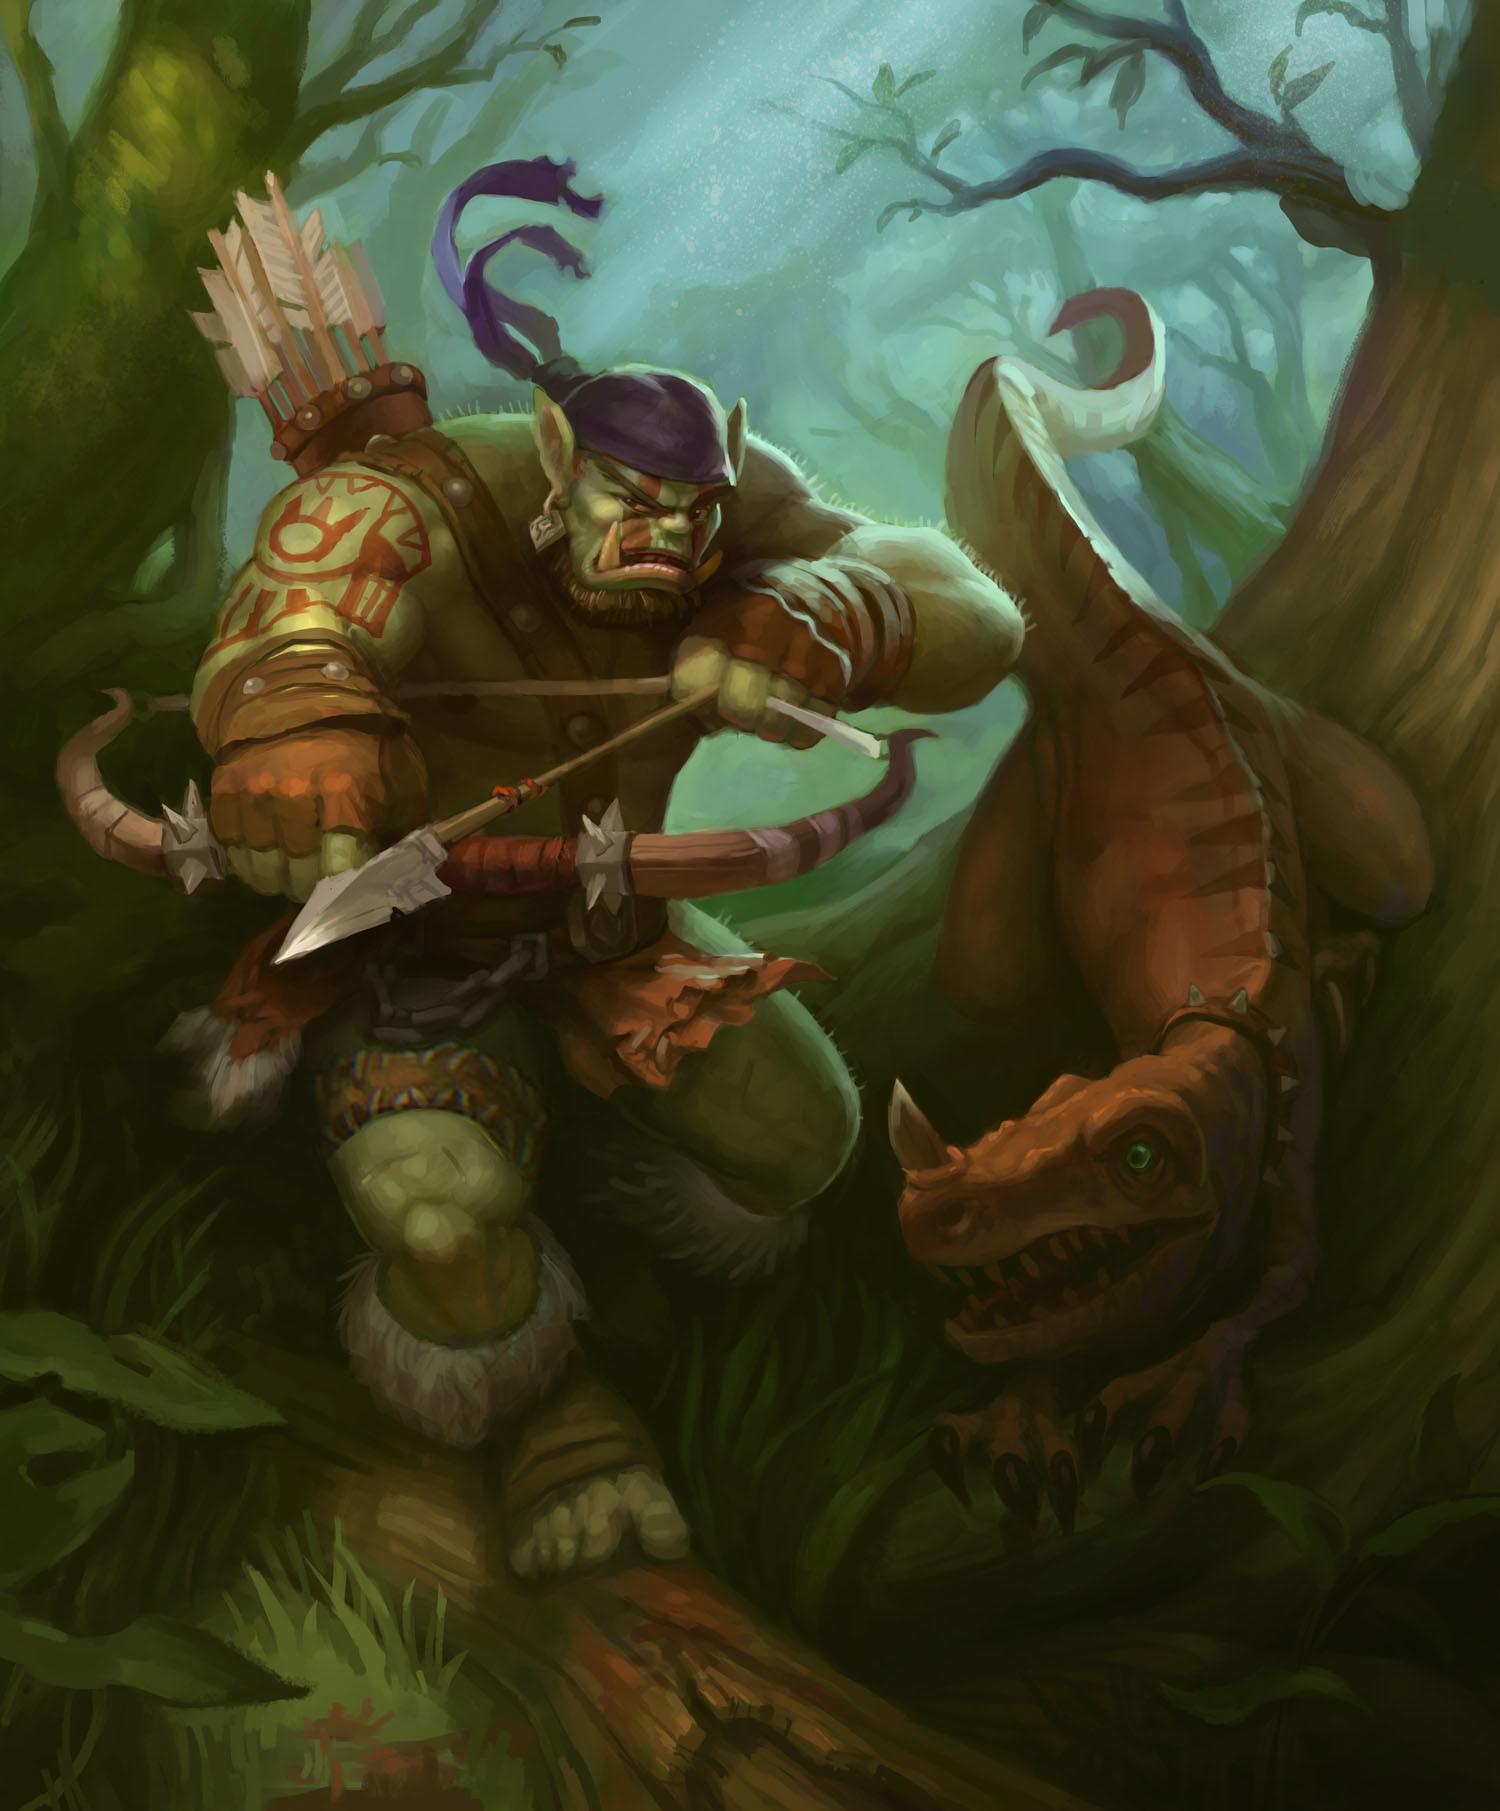 ArtStation - Orc Hunter, Ishmael Hoover